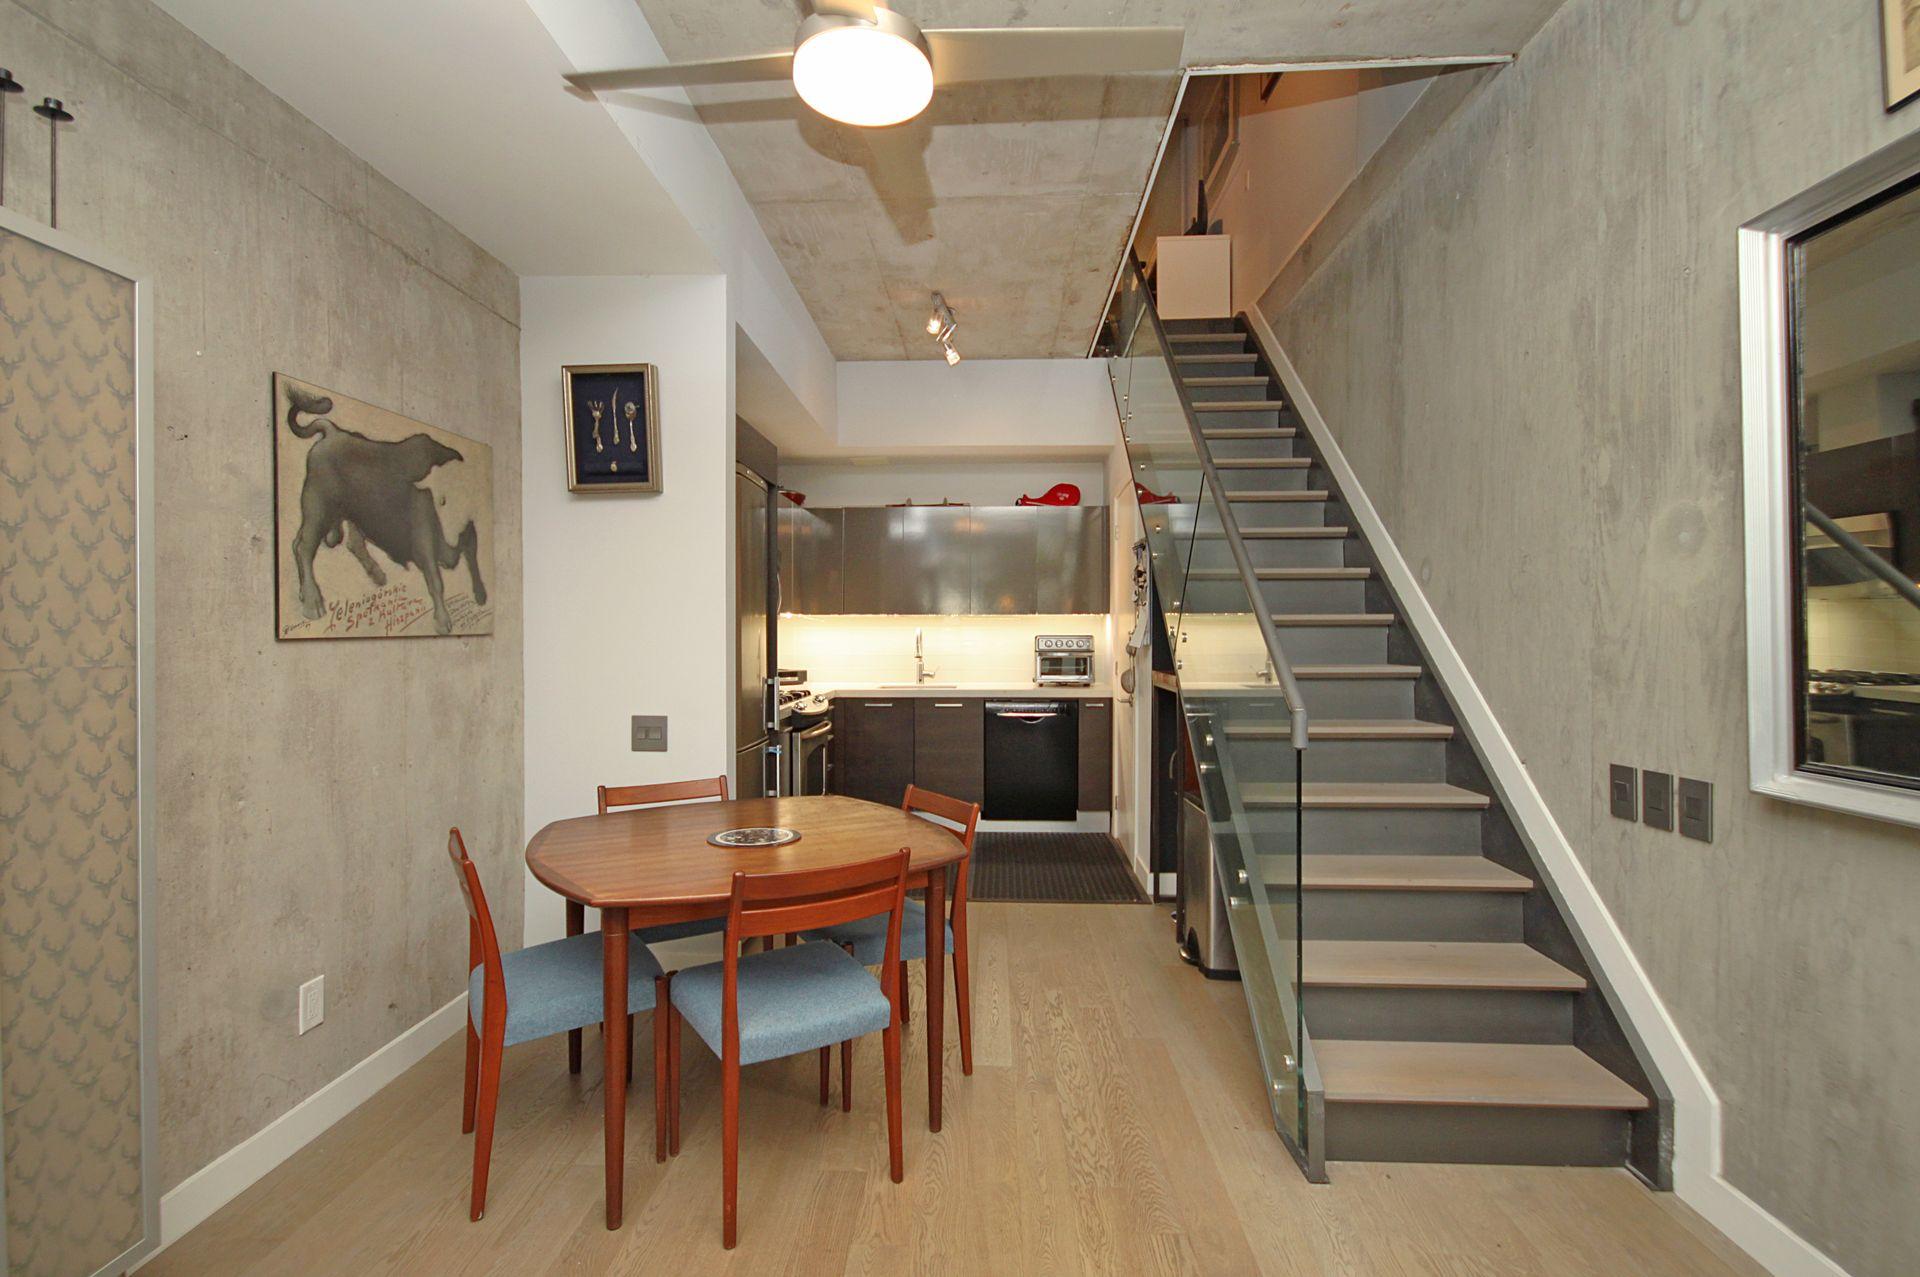 Dining Room at TH6 - 25 Stafford Street, Niagara, Toronto